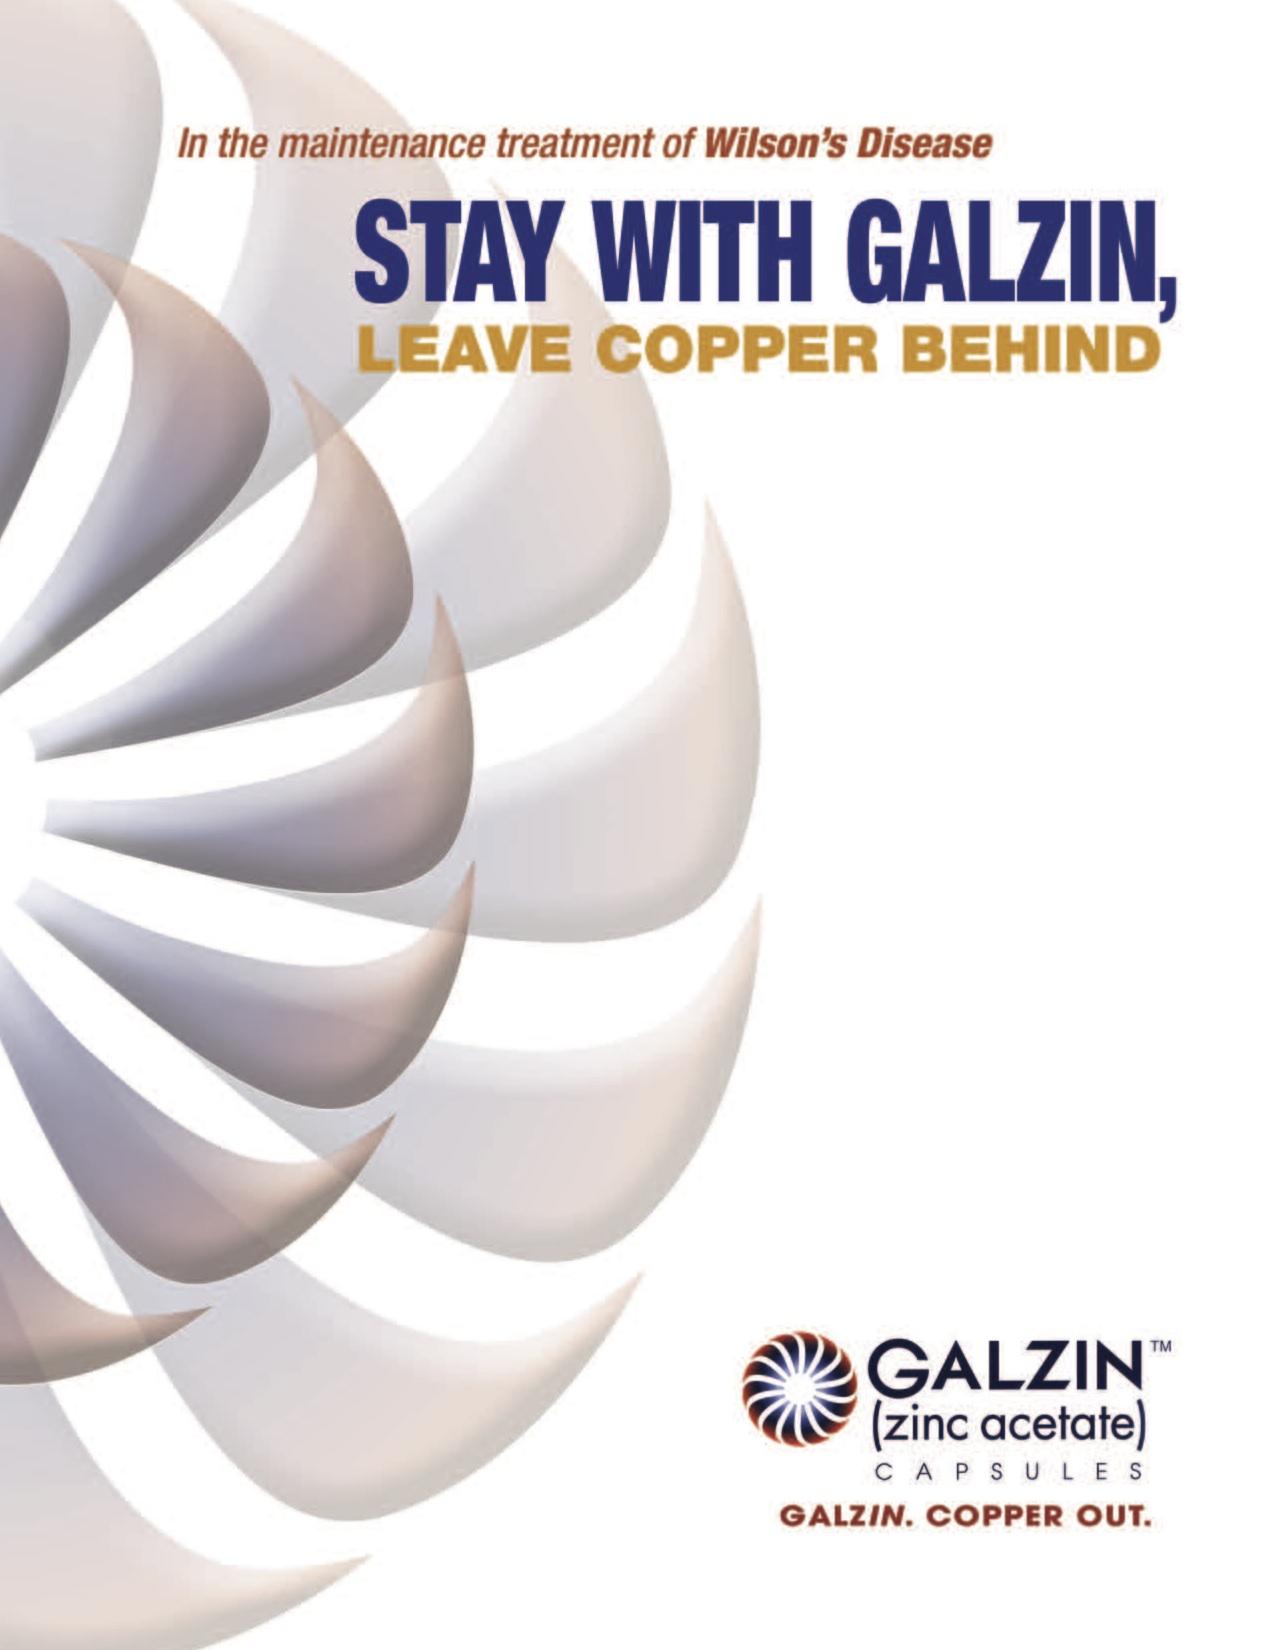 Galzin-Covers-Swirl.jpg